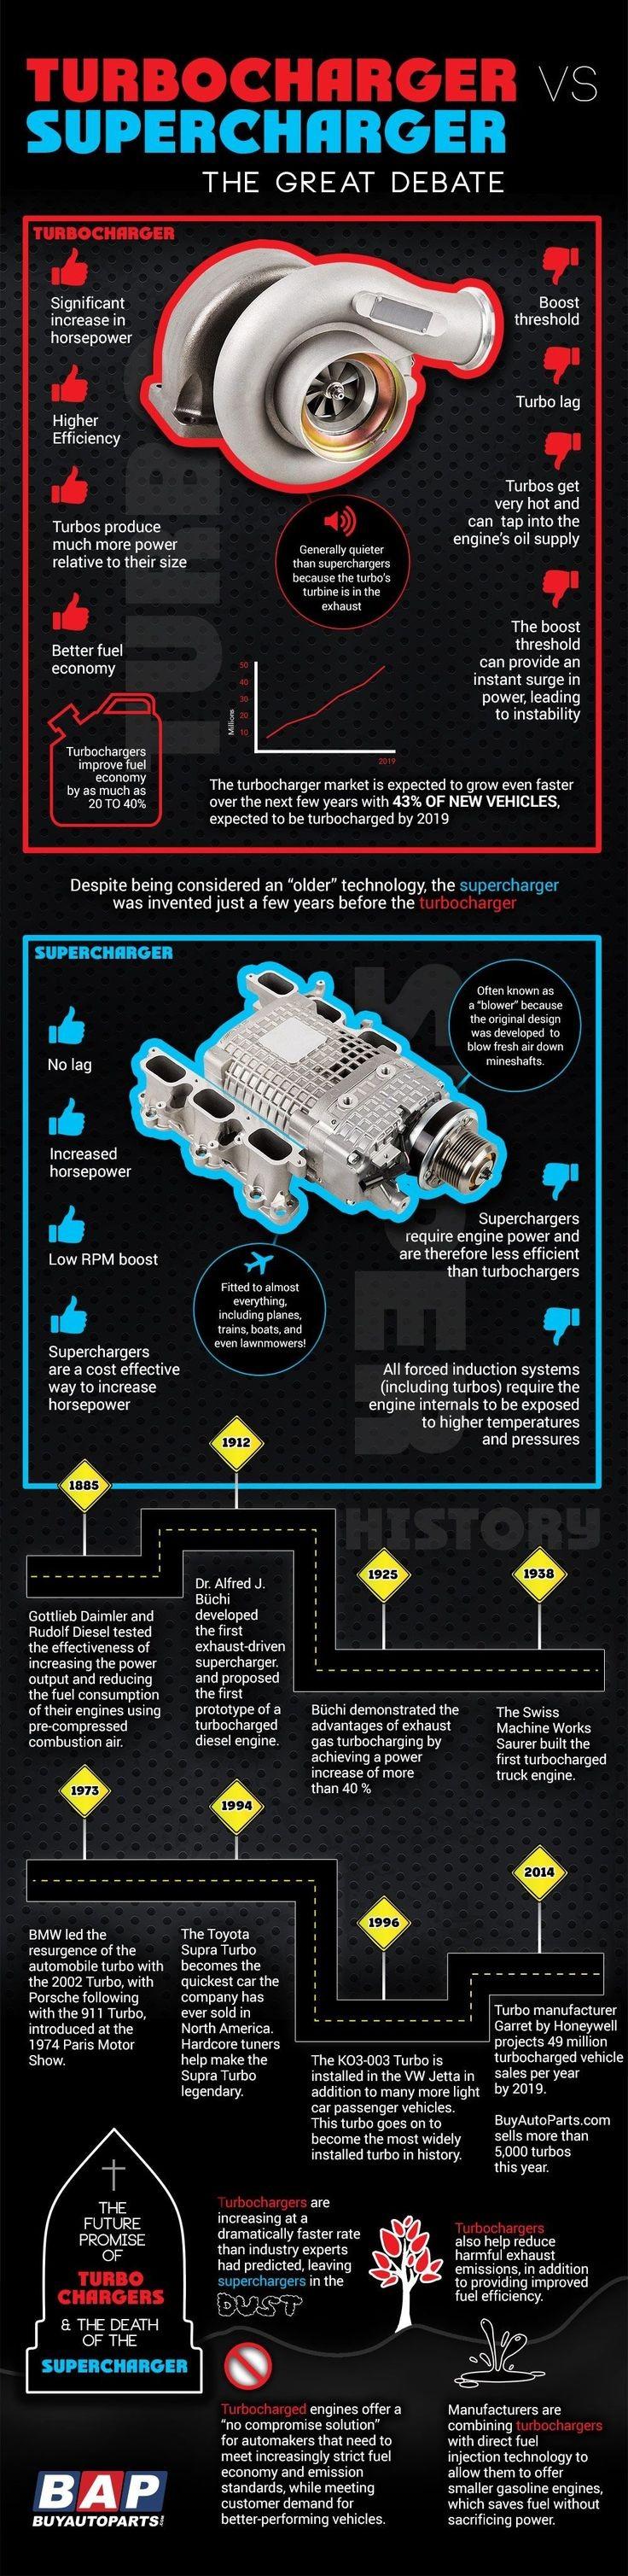 Car Engine Diagram Animation 18 Best Motor Engine Images On Pinterest Of Car Engine Diagram Animation